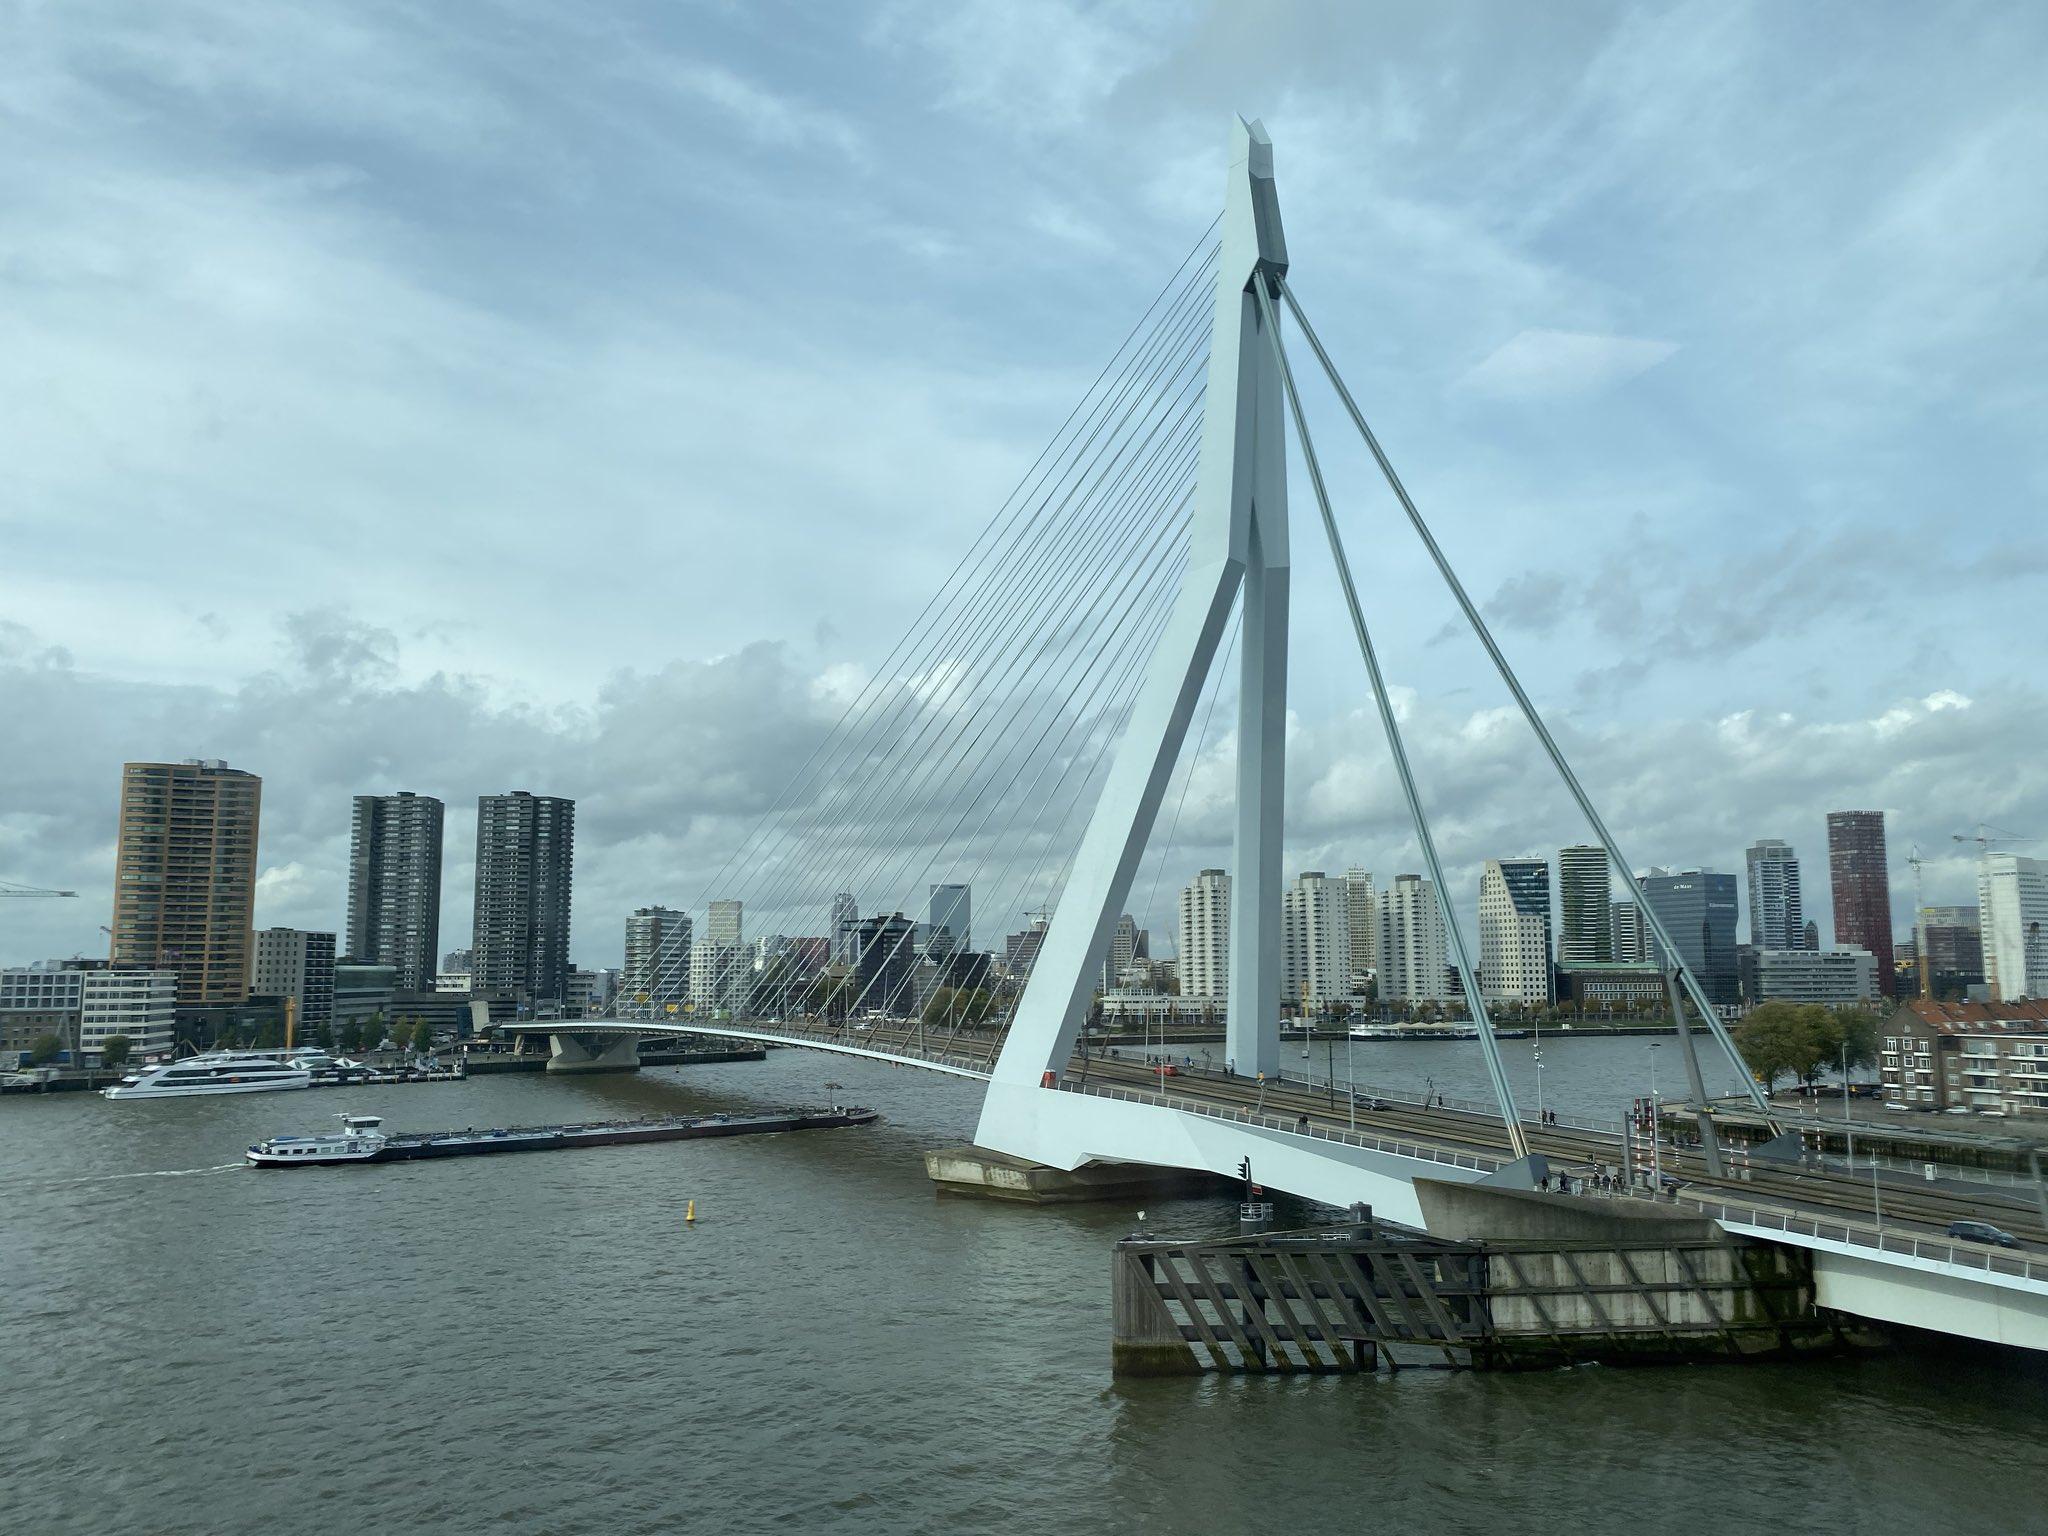 Rotterdam is cool. https://t.co/22hEBOQZhZ